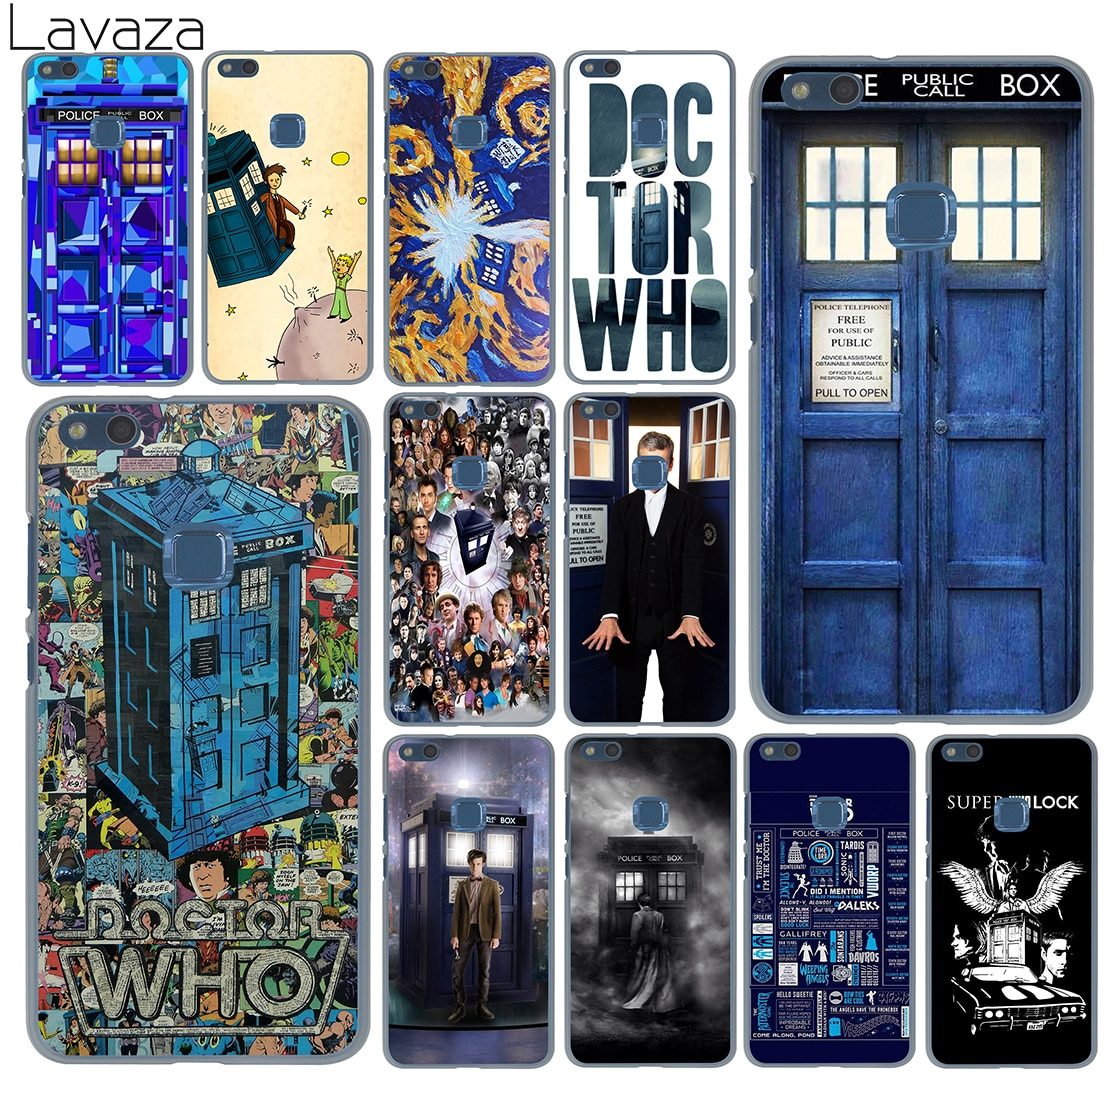 Doctor who tardis Lavaza artwork azul Caso para Huawei P30 P20 Pro P9 P10 Plus P8 Mini Lite 2016 2017 P Z inteligente 2019